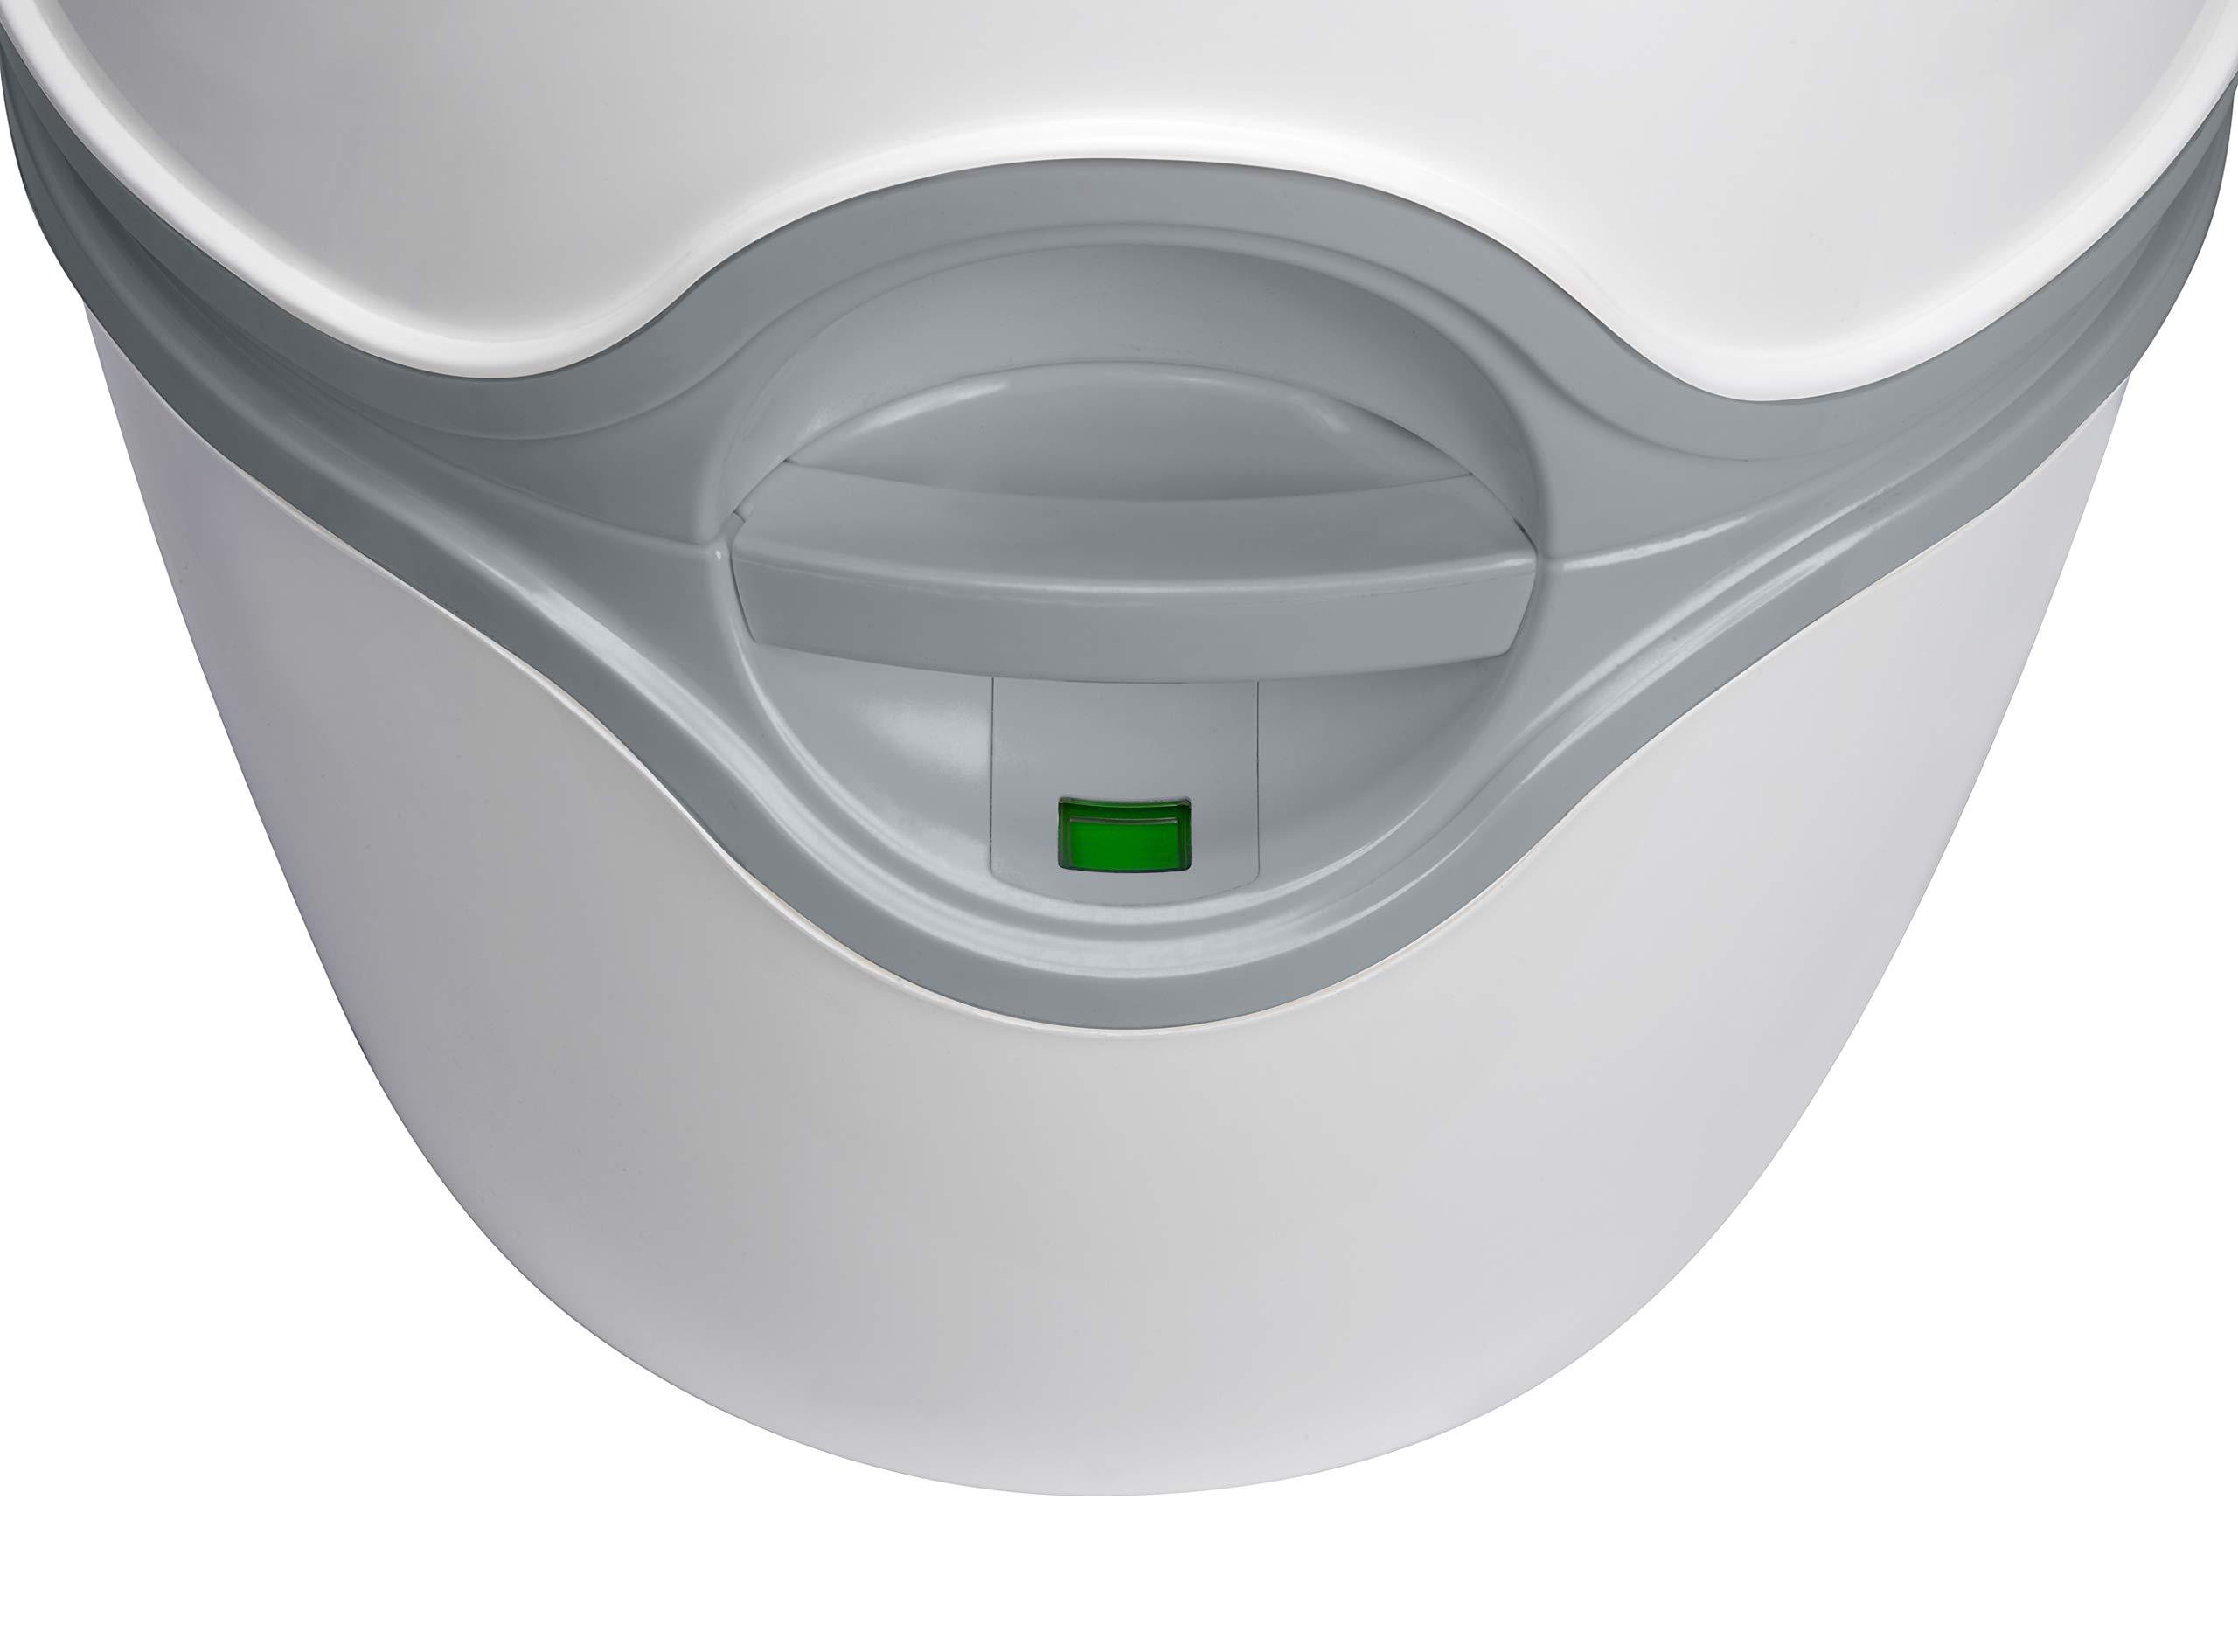 Thetford 92305 Porta Potti 565P Excellence Portable Toilet (Manual), 448 x 388 x 450 mm 10